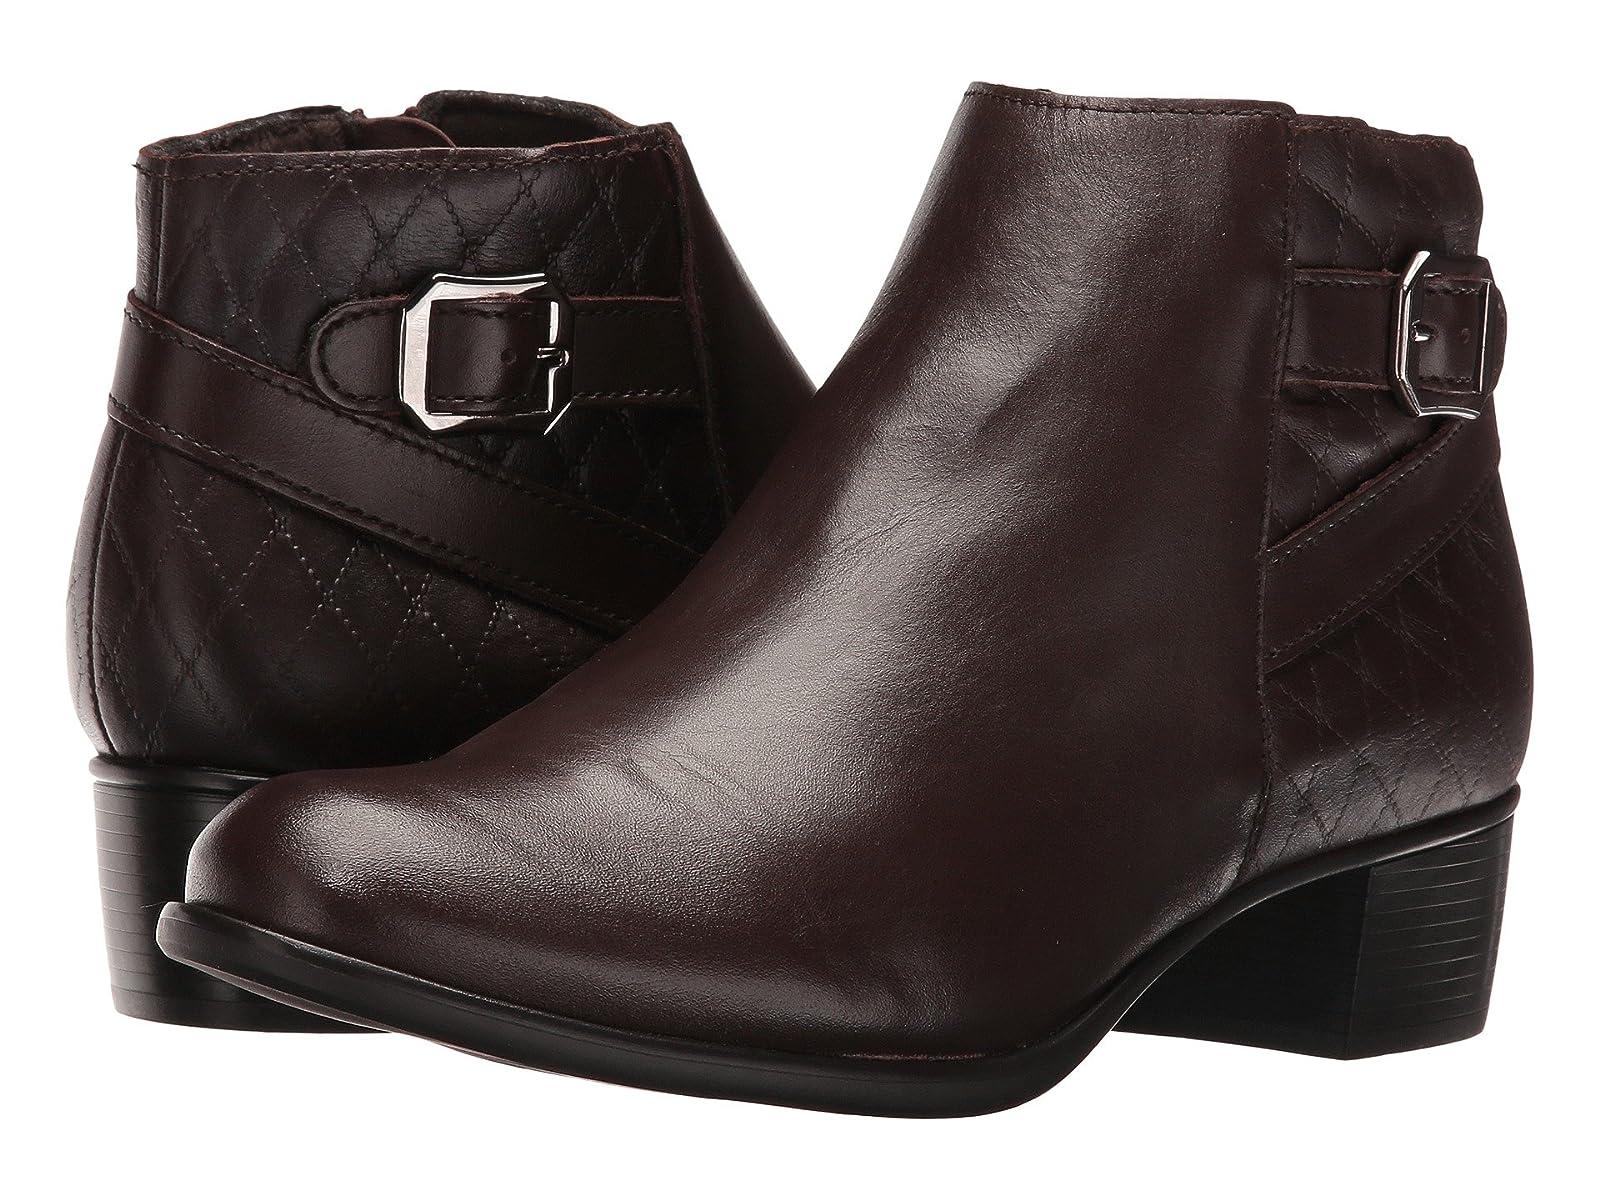 Munro JolynnCheap and distinctive eye-catching shoes